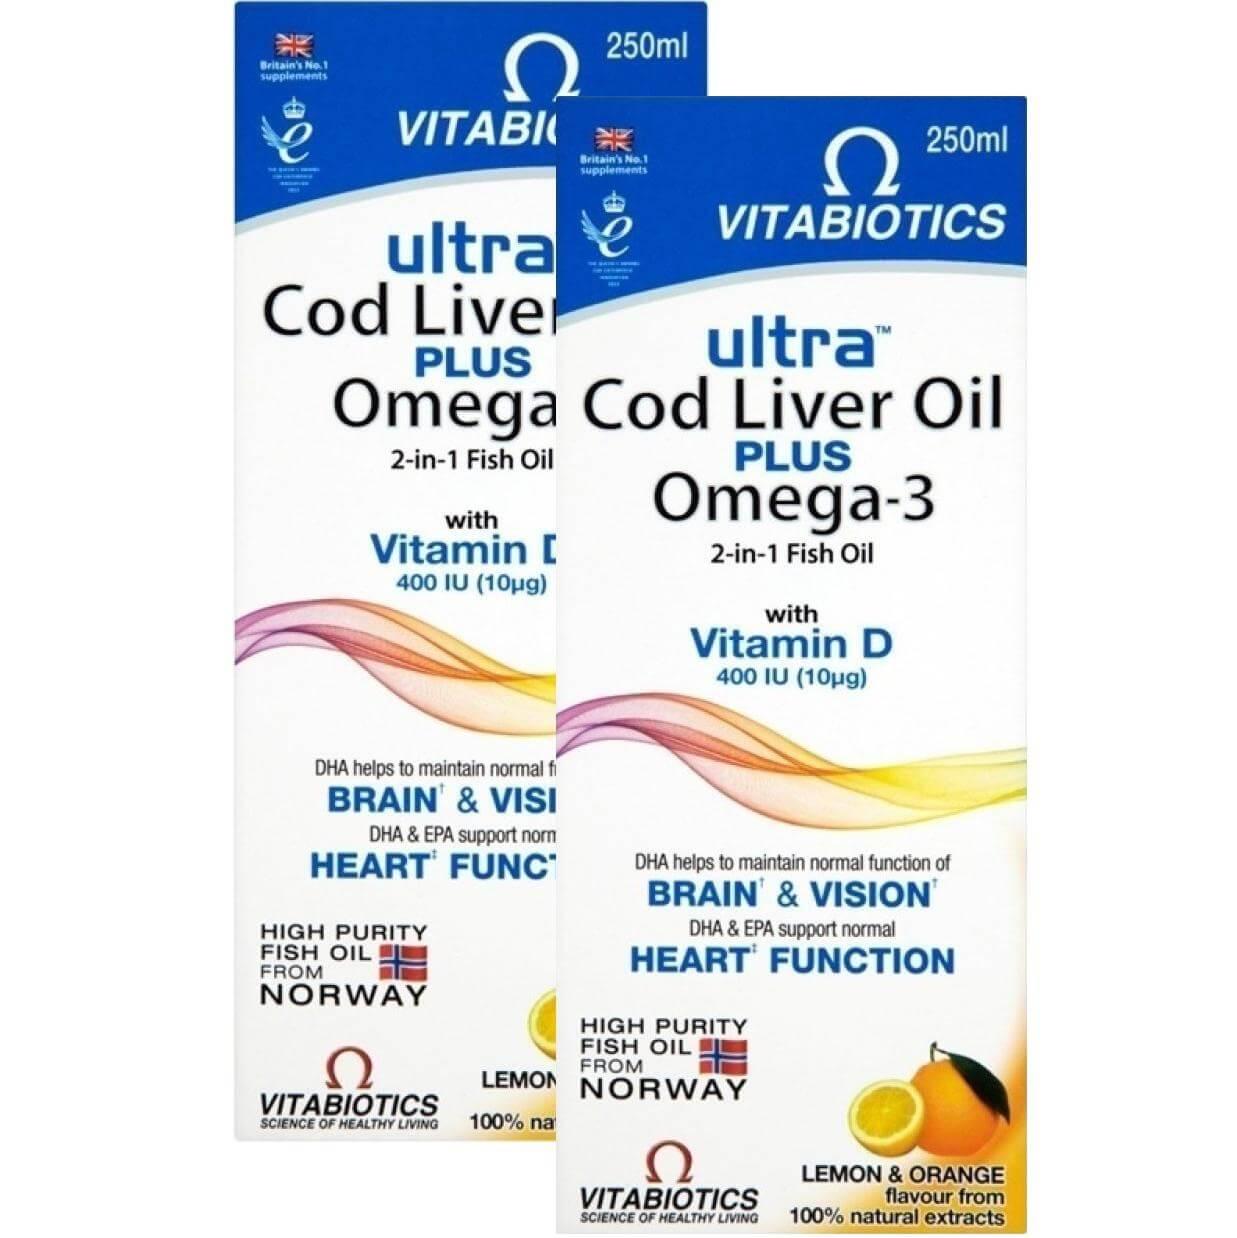 Vitabiotics Πακέτο Προσφοράς Ultra 2 in 1 Cod Liver Oil Liquid Συνδυασμός Ωμέγα-3 Ιχθυελαίων & Μουρουνέλαιου 250ml 1+1 Δώρο